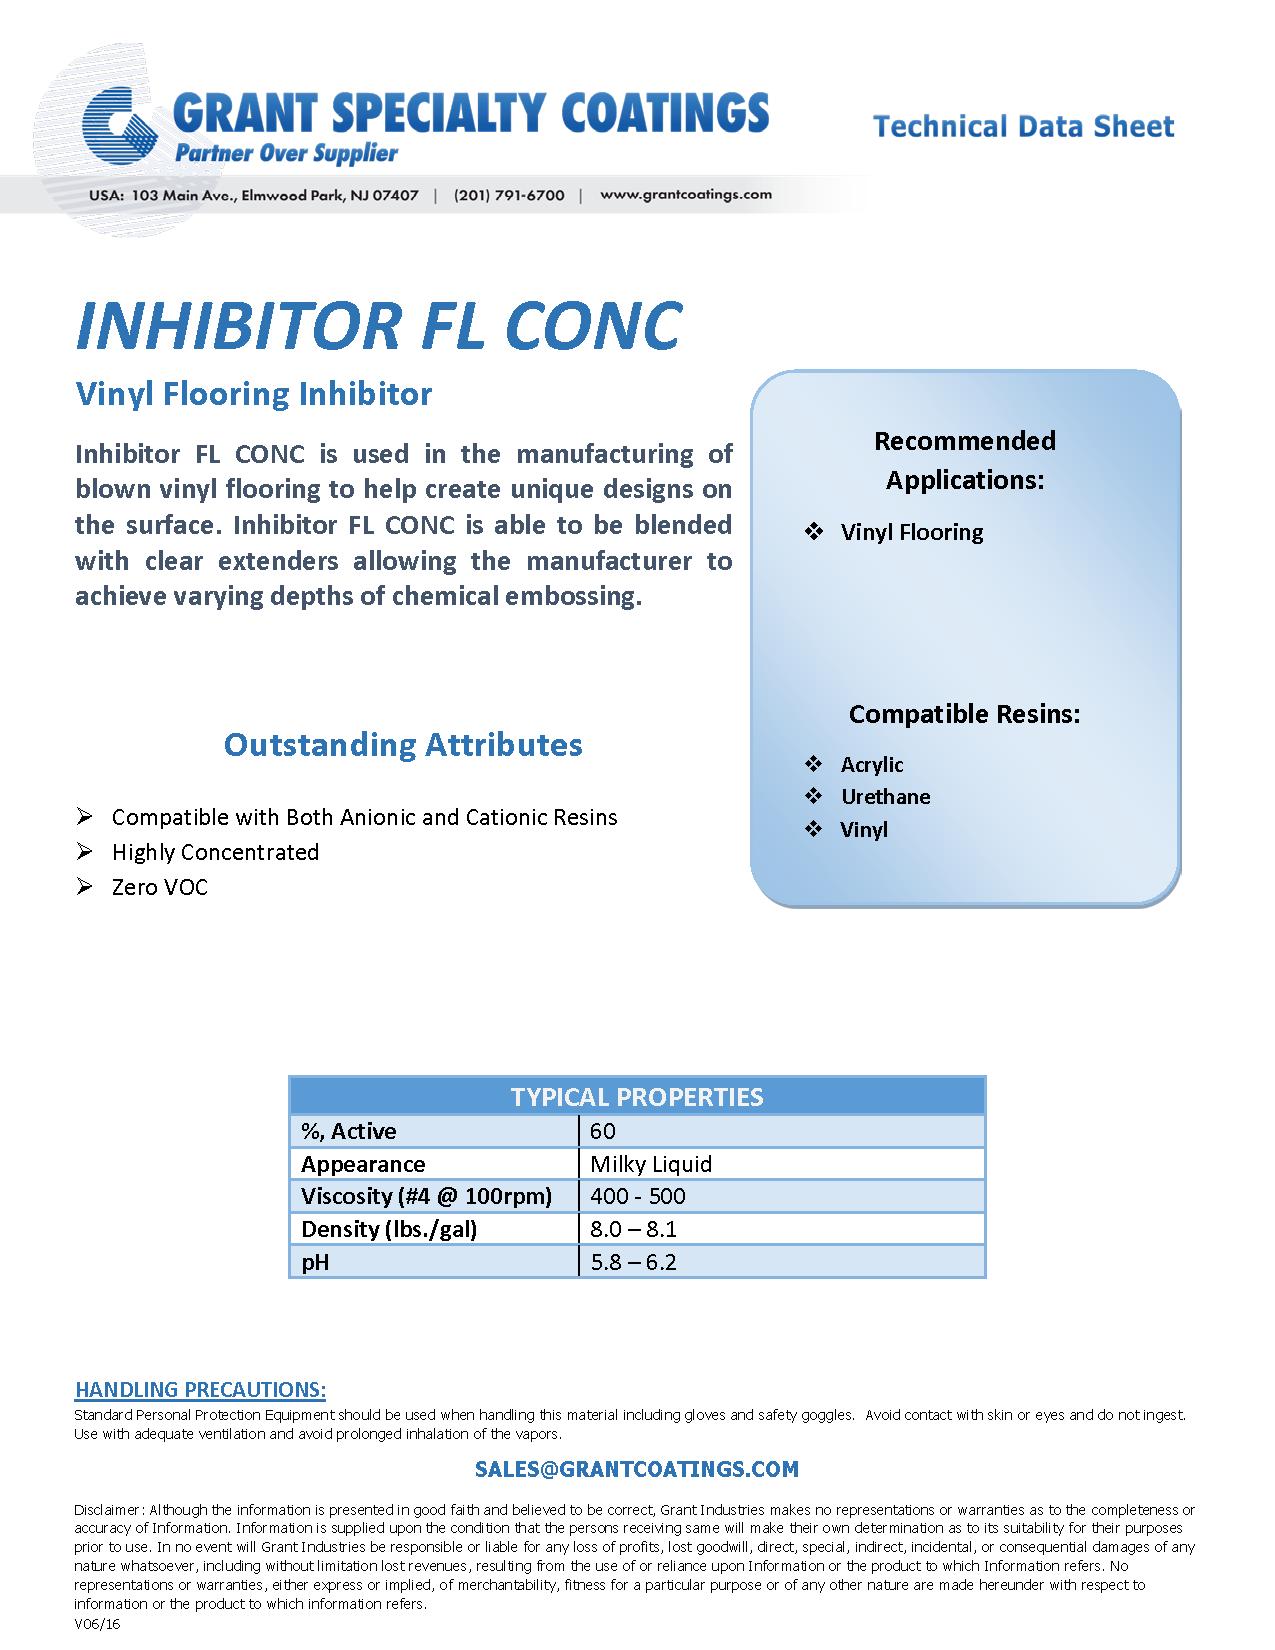 Inhibitor FL Conc for Blown Vinyl Flooring.png